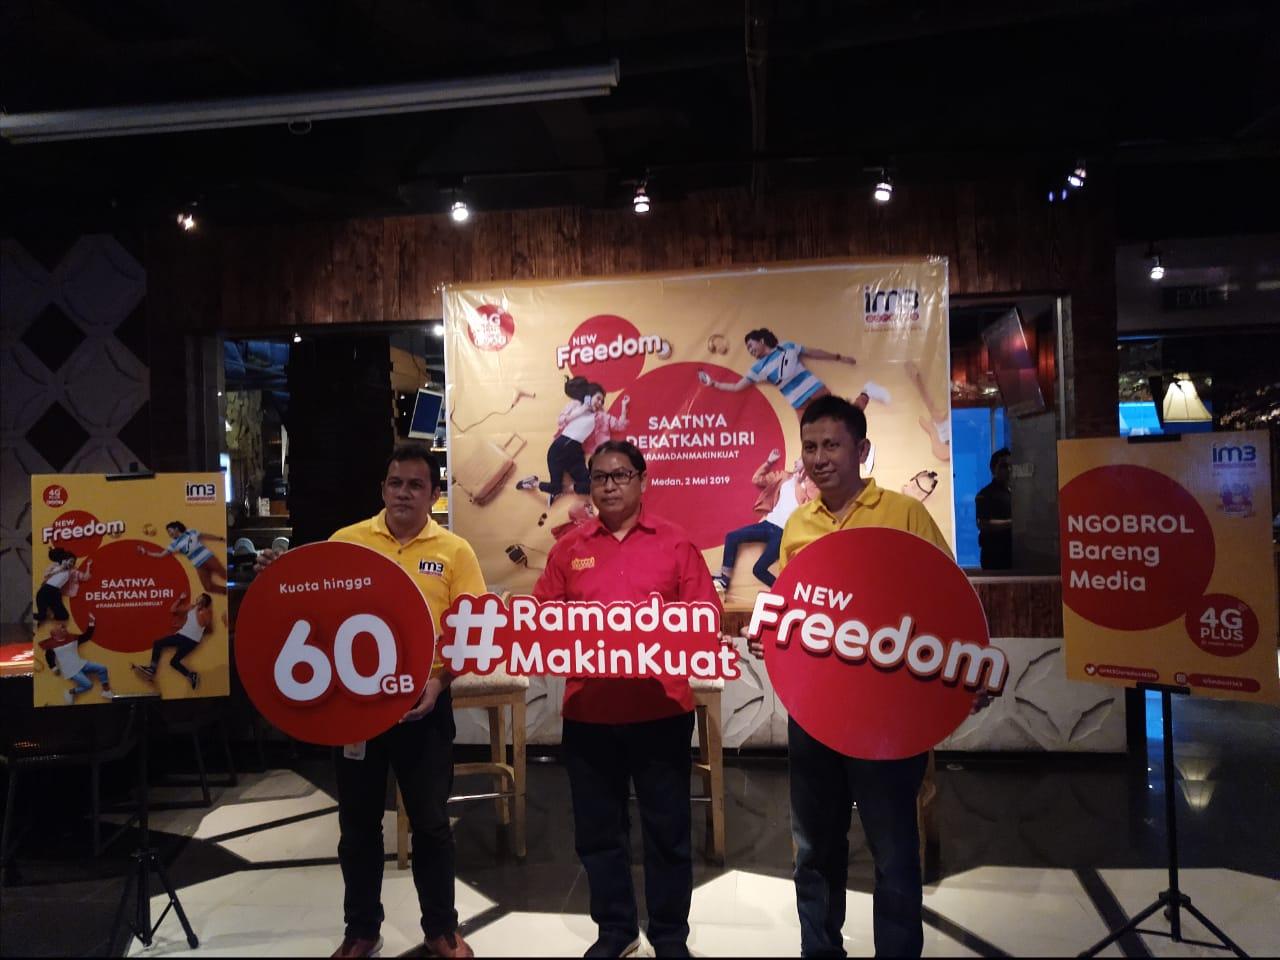 Eratkan Silaturahmi #RamadanMakinKuat dengan Paket New Freedom IM3 Ooredoo